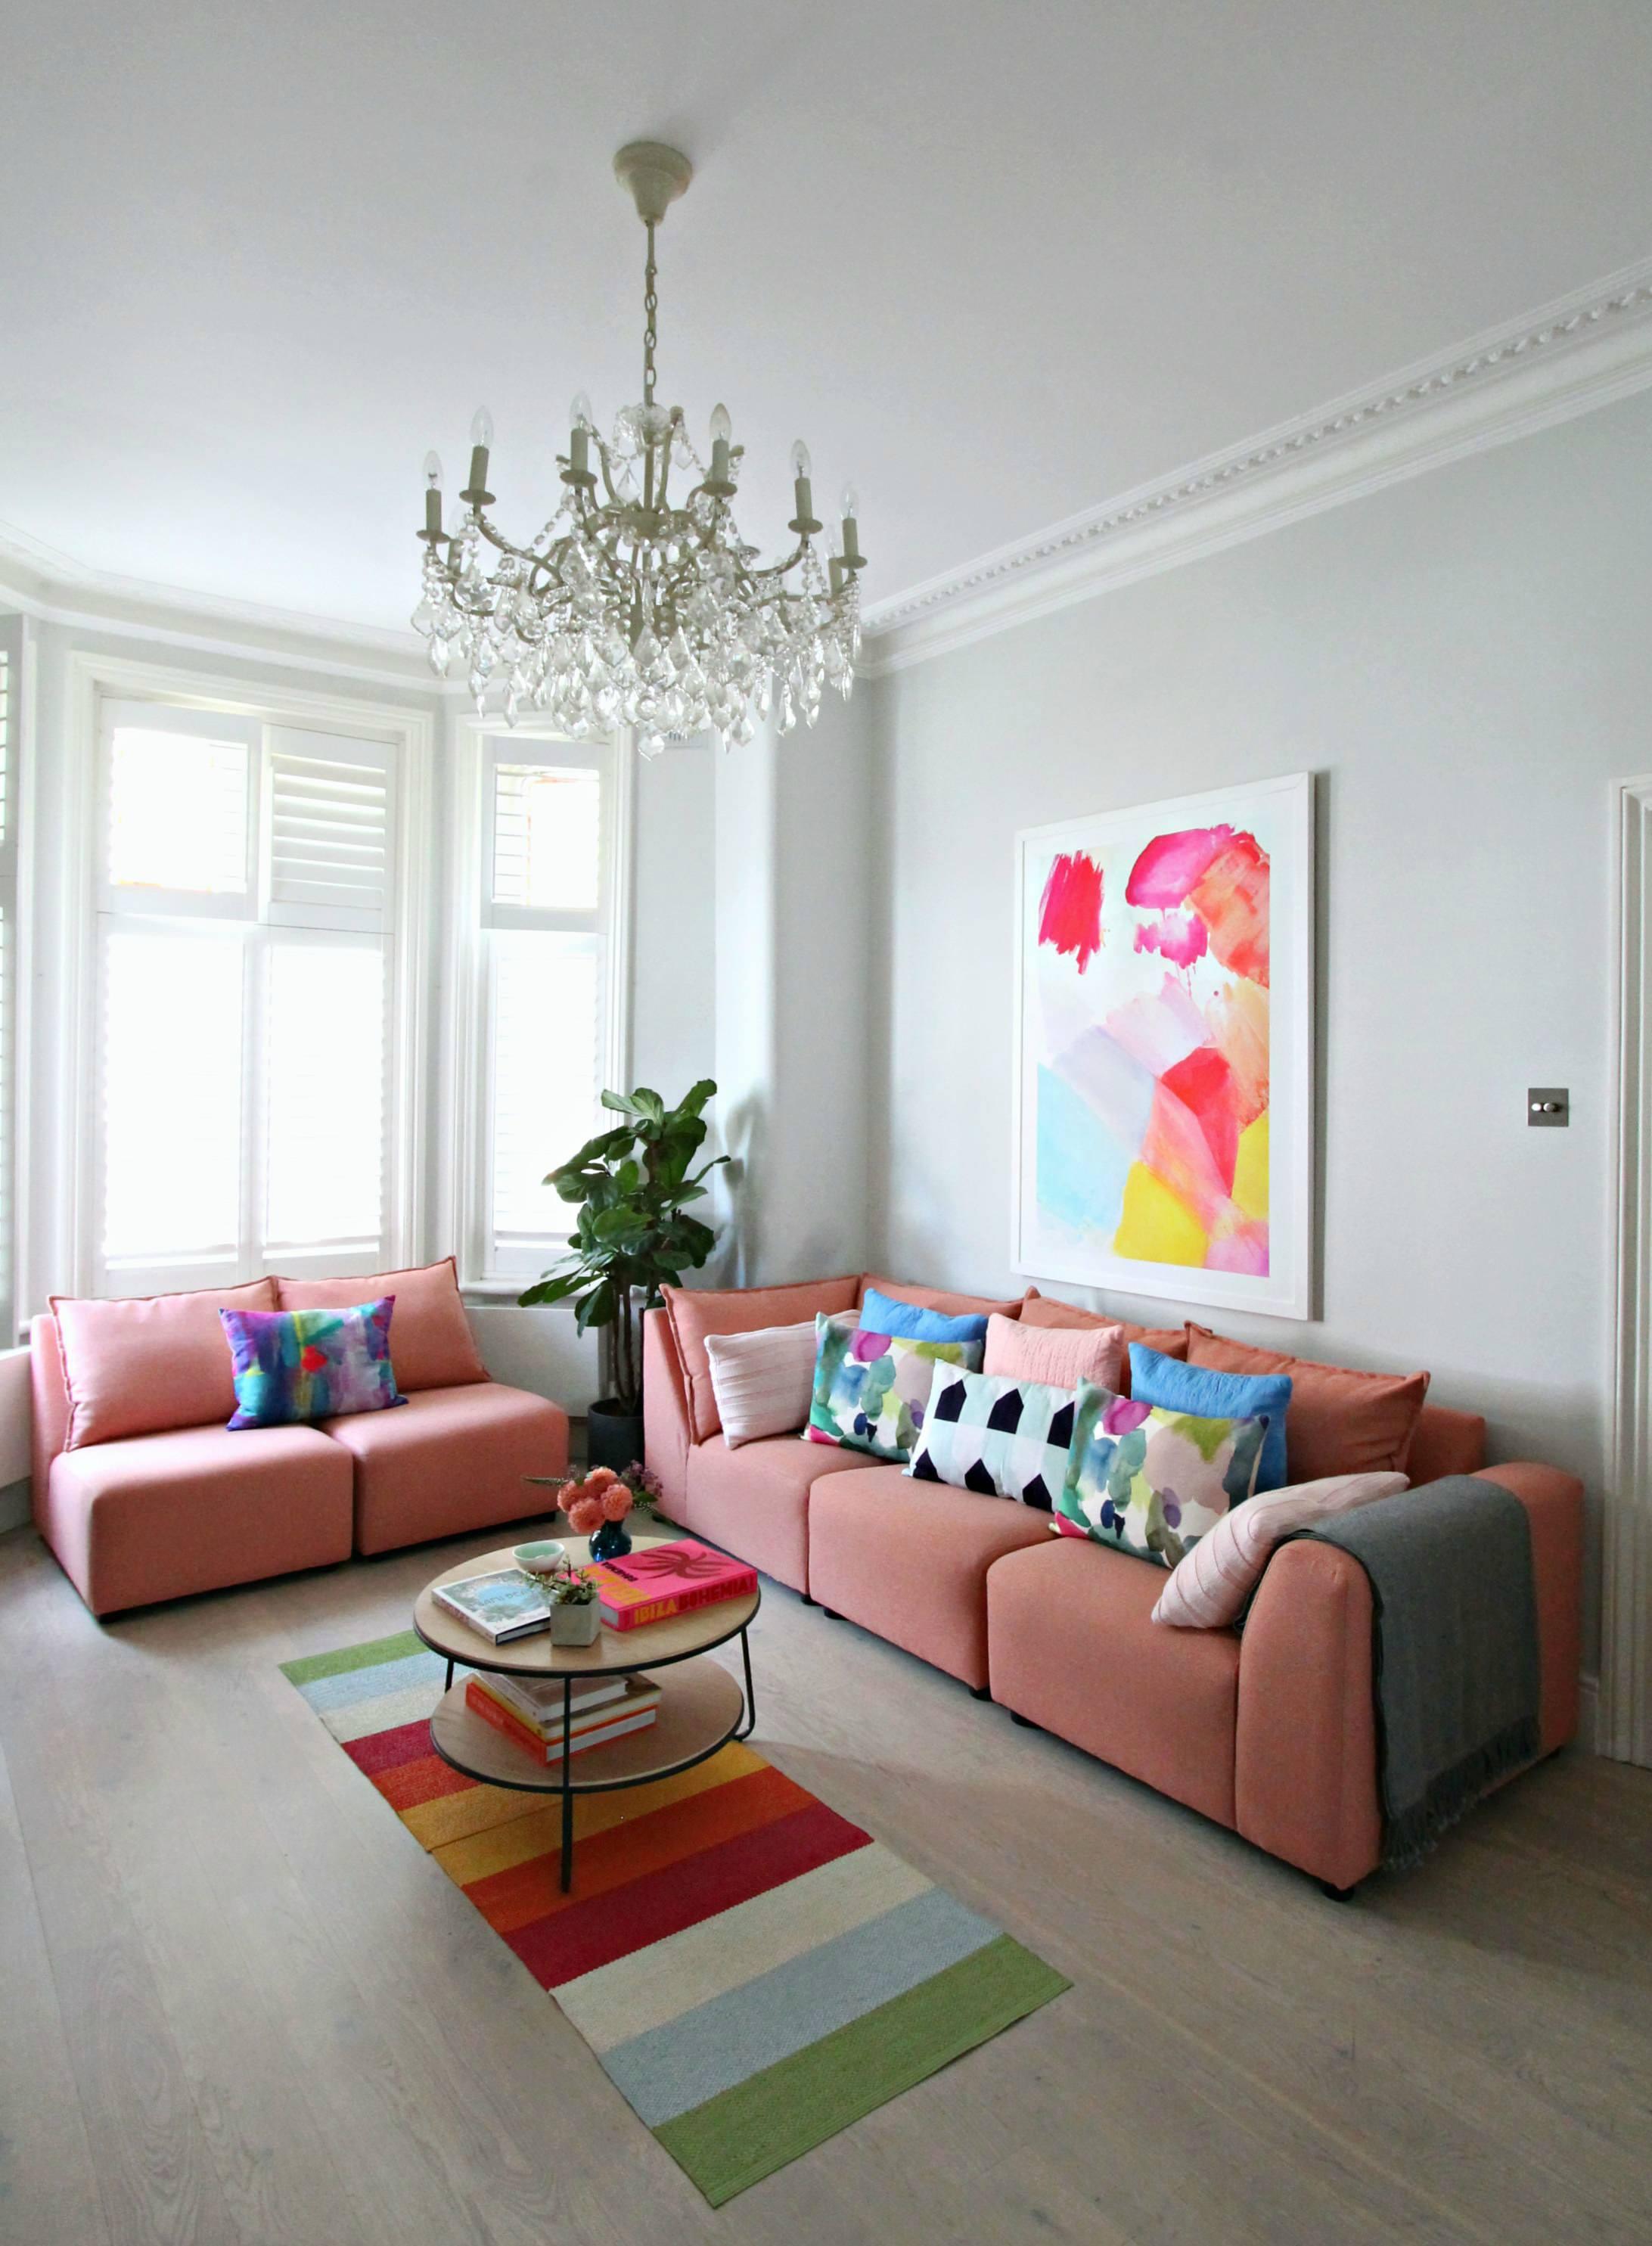 Autumn Living Room Decorating Ideas: LittleBIGBELL An Autumn Living Room Refresh And Update